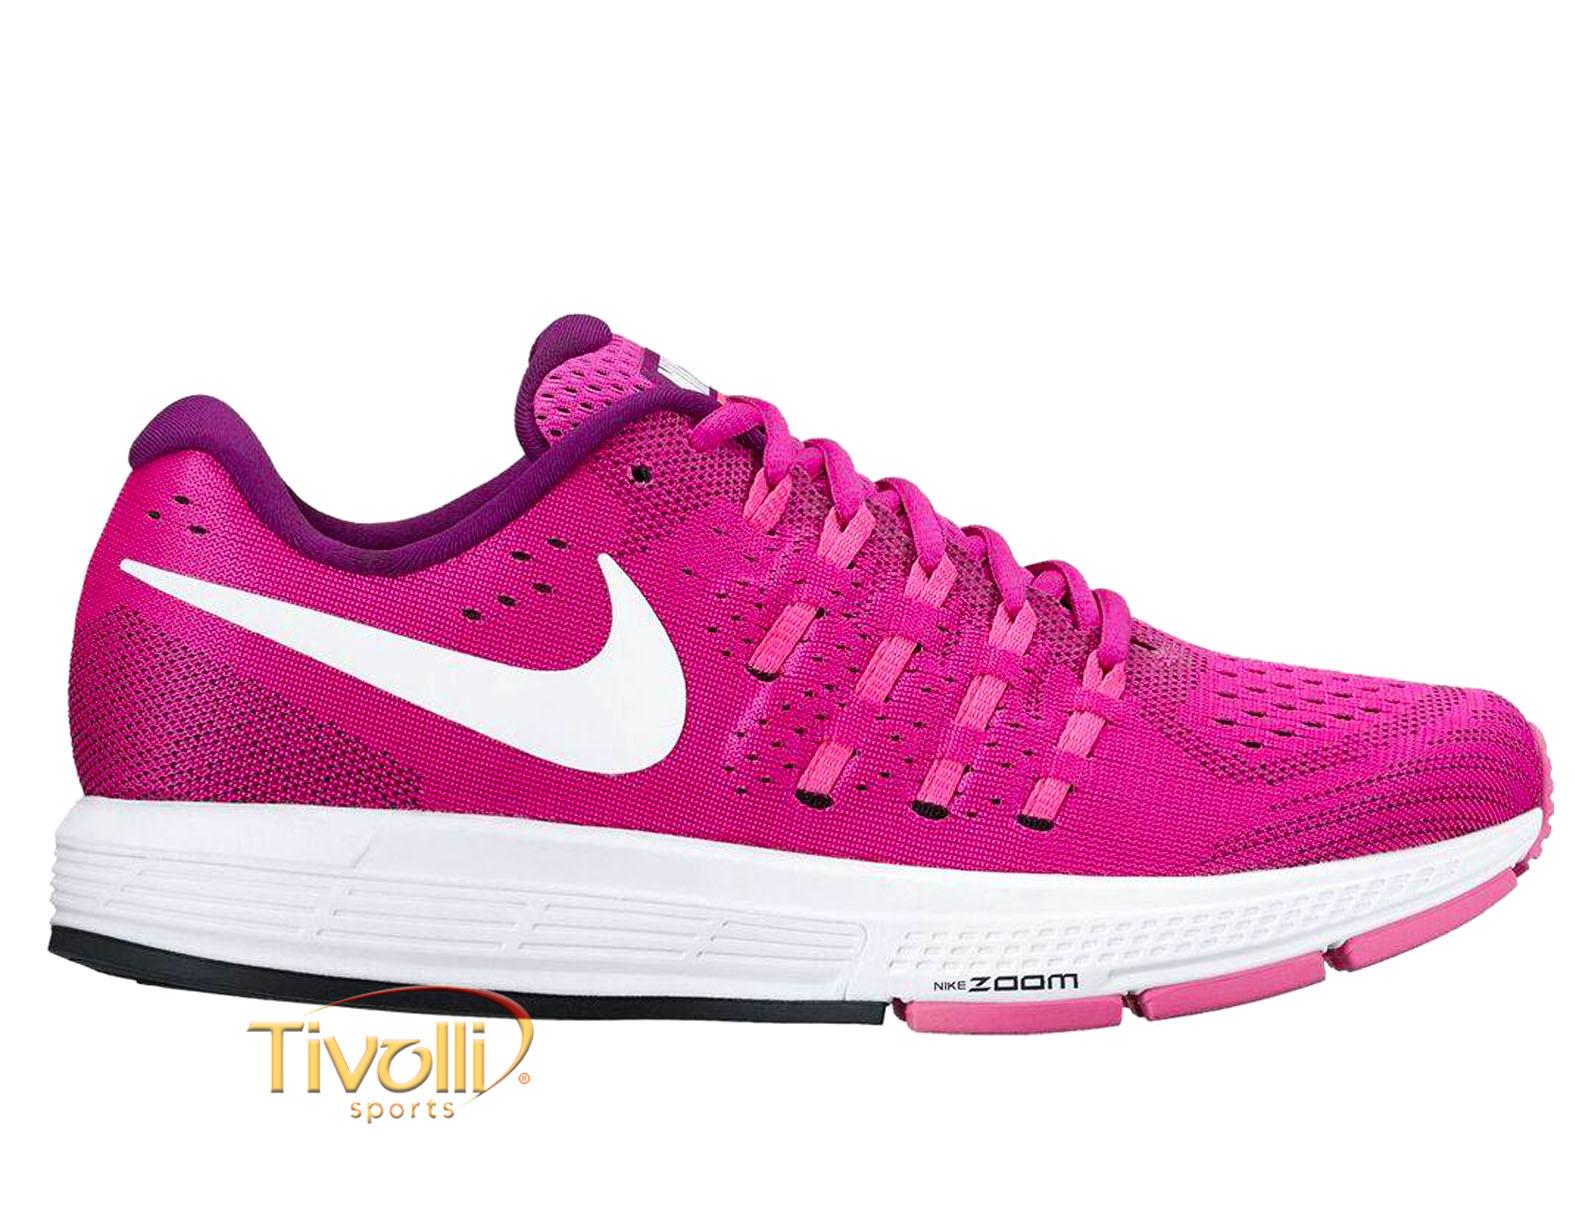 b571e5cf67 Raquete Mania > Tênis Nike Air Zoom Vomero 11 > Rosa Roxo